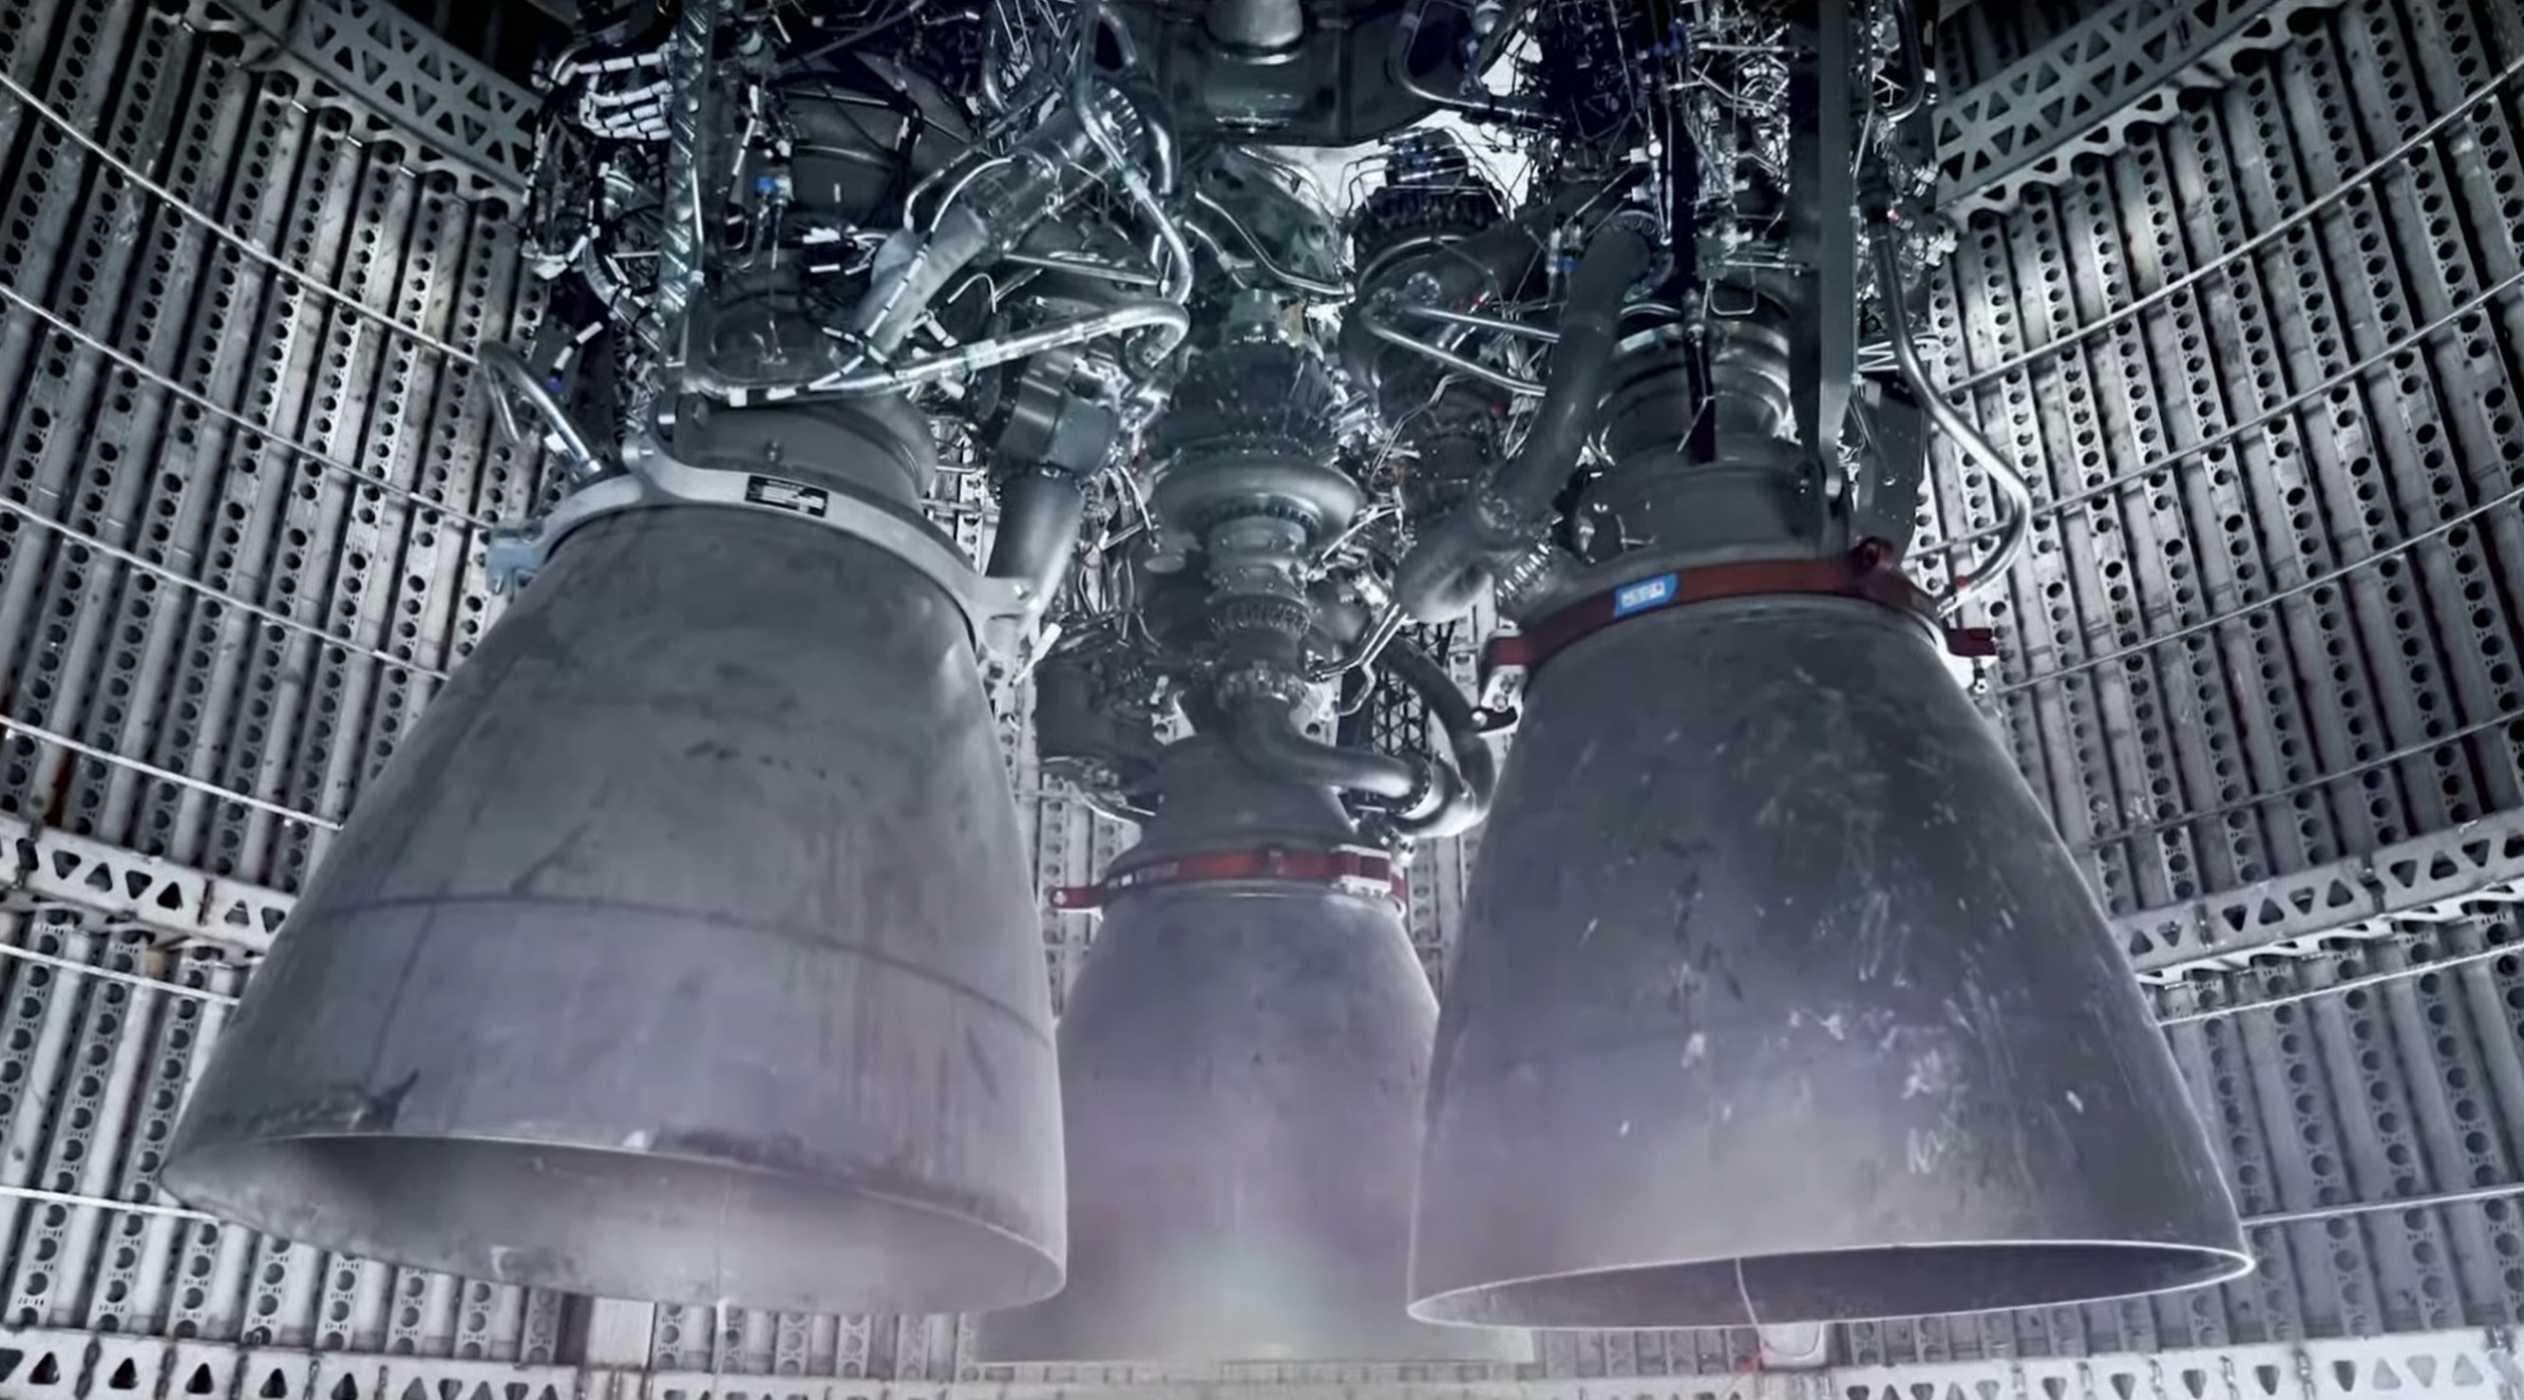 Starship update Starlink V1 L5 webcast 031520 (SpaceX) Raptor Mk1 3 (c)